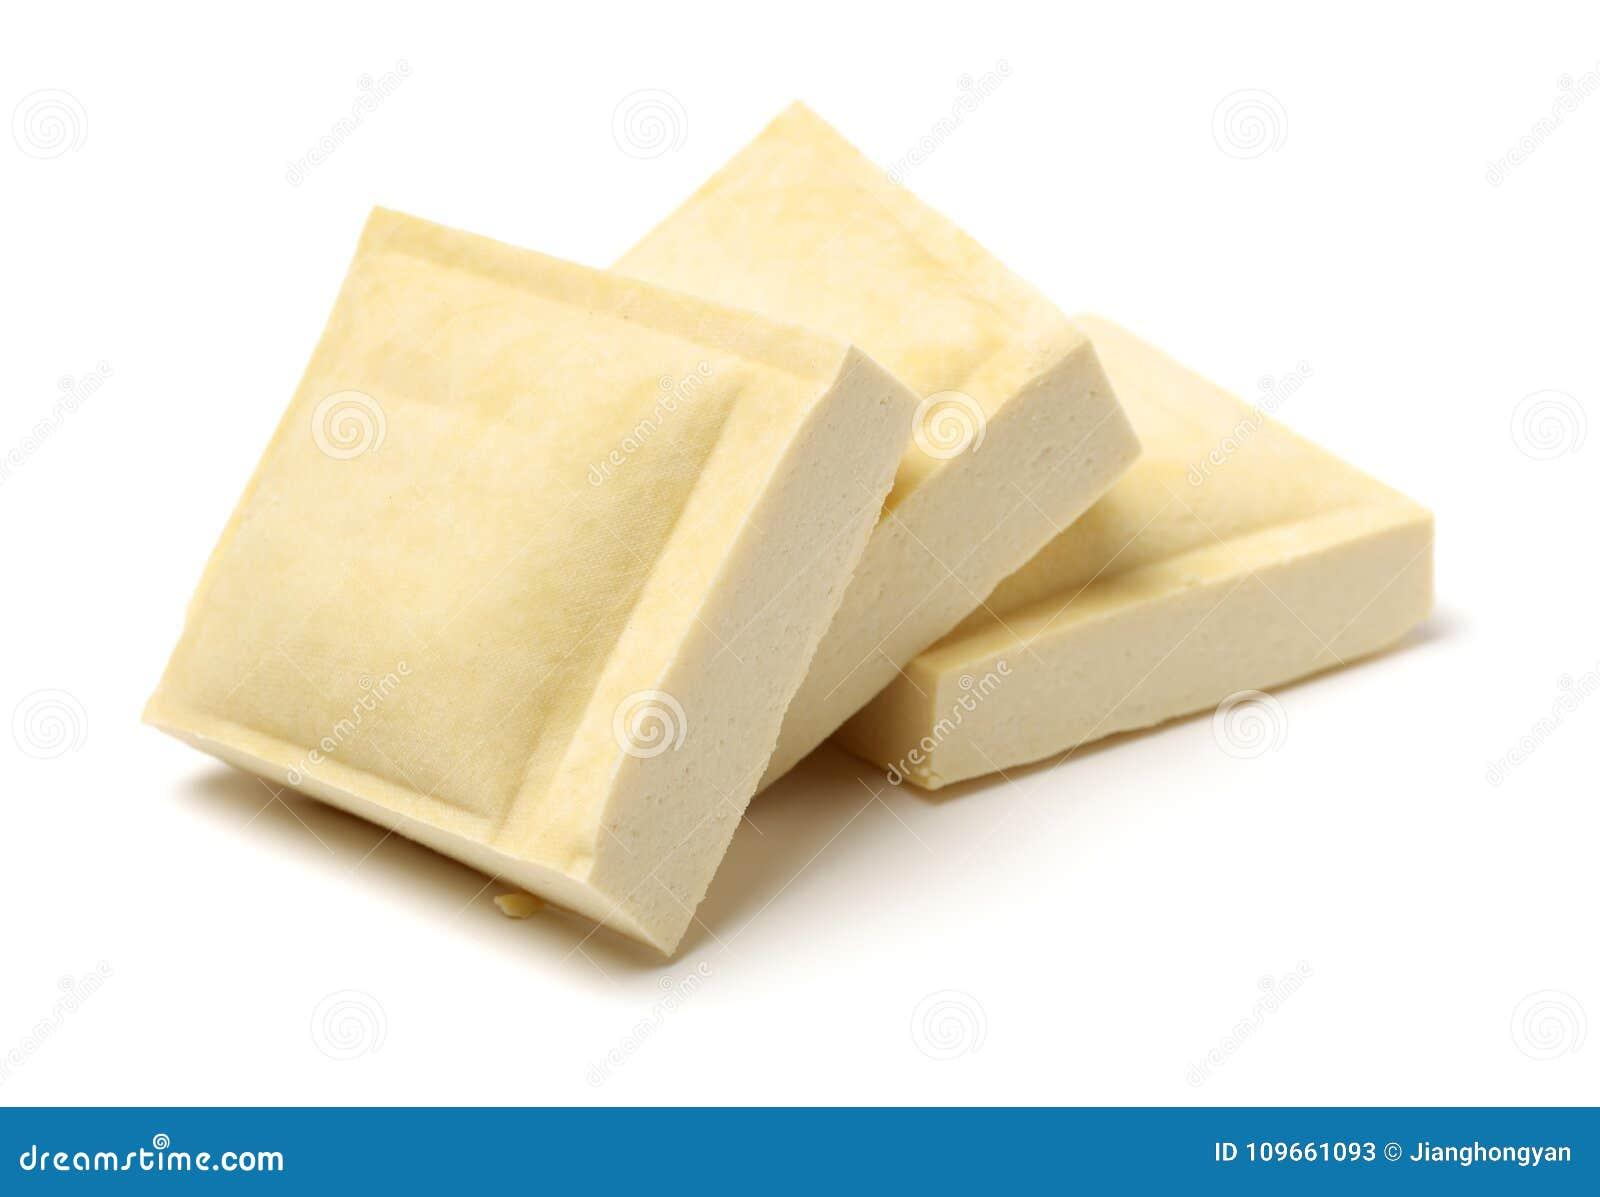 Koya tofu, freeze-dried bean curd, japanese food